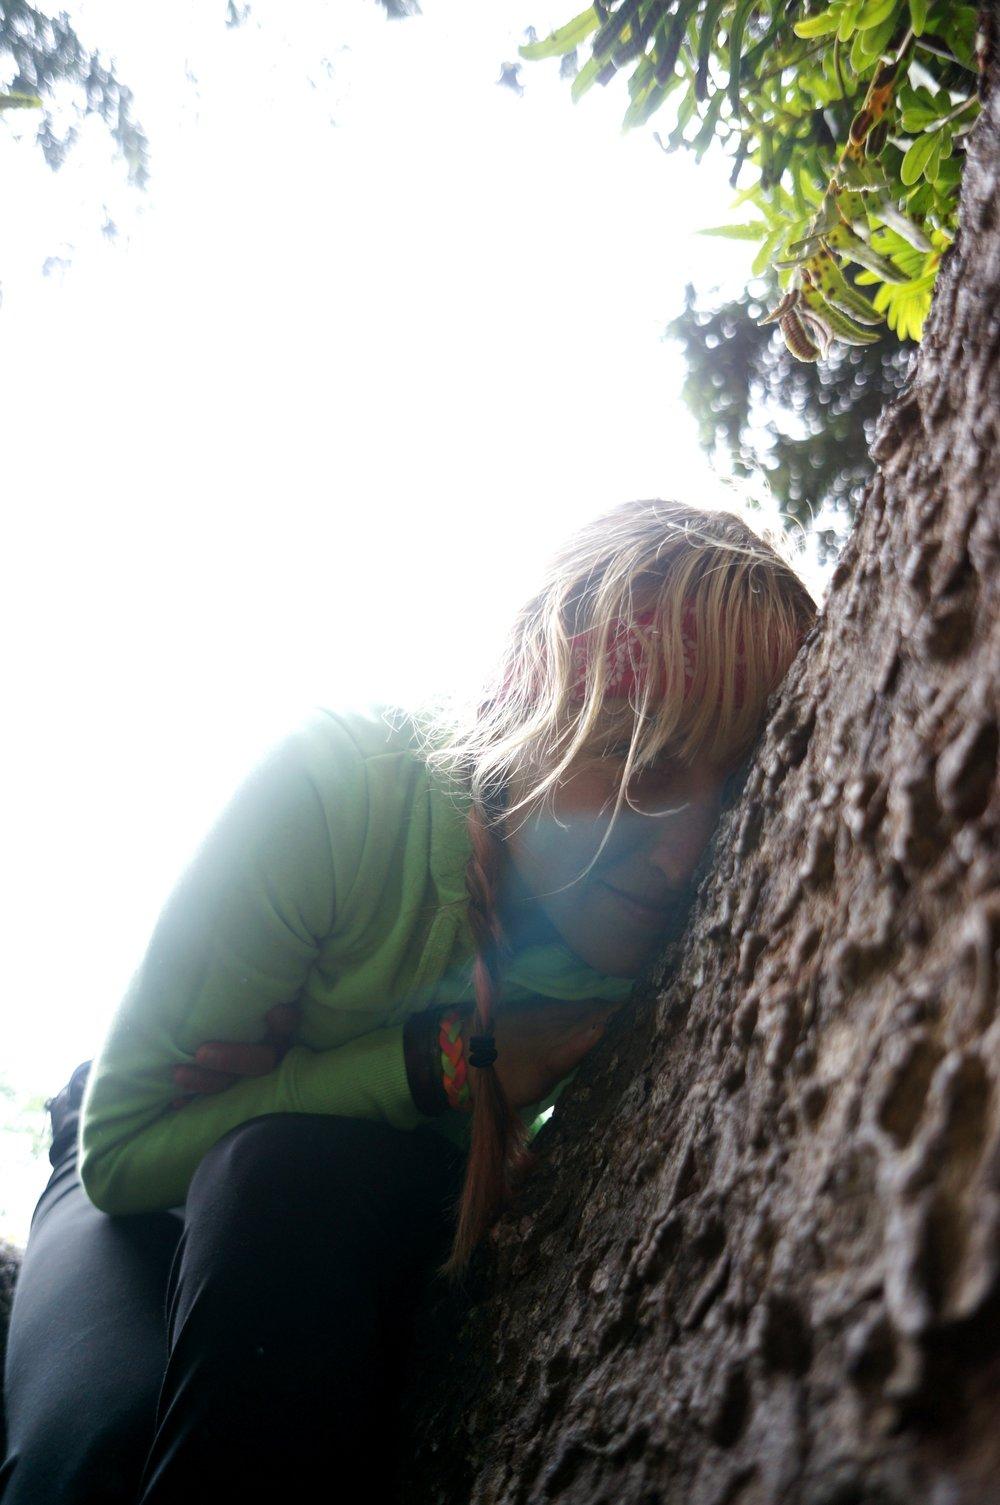 oregon_fern_canyon_candice_tree.jpg